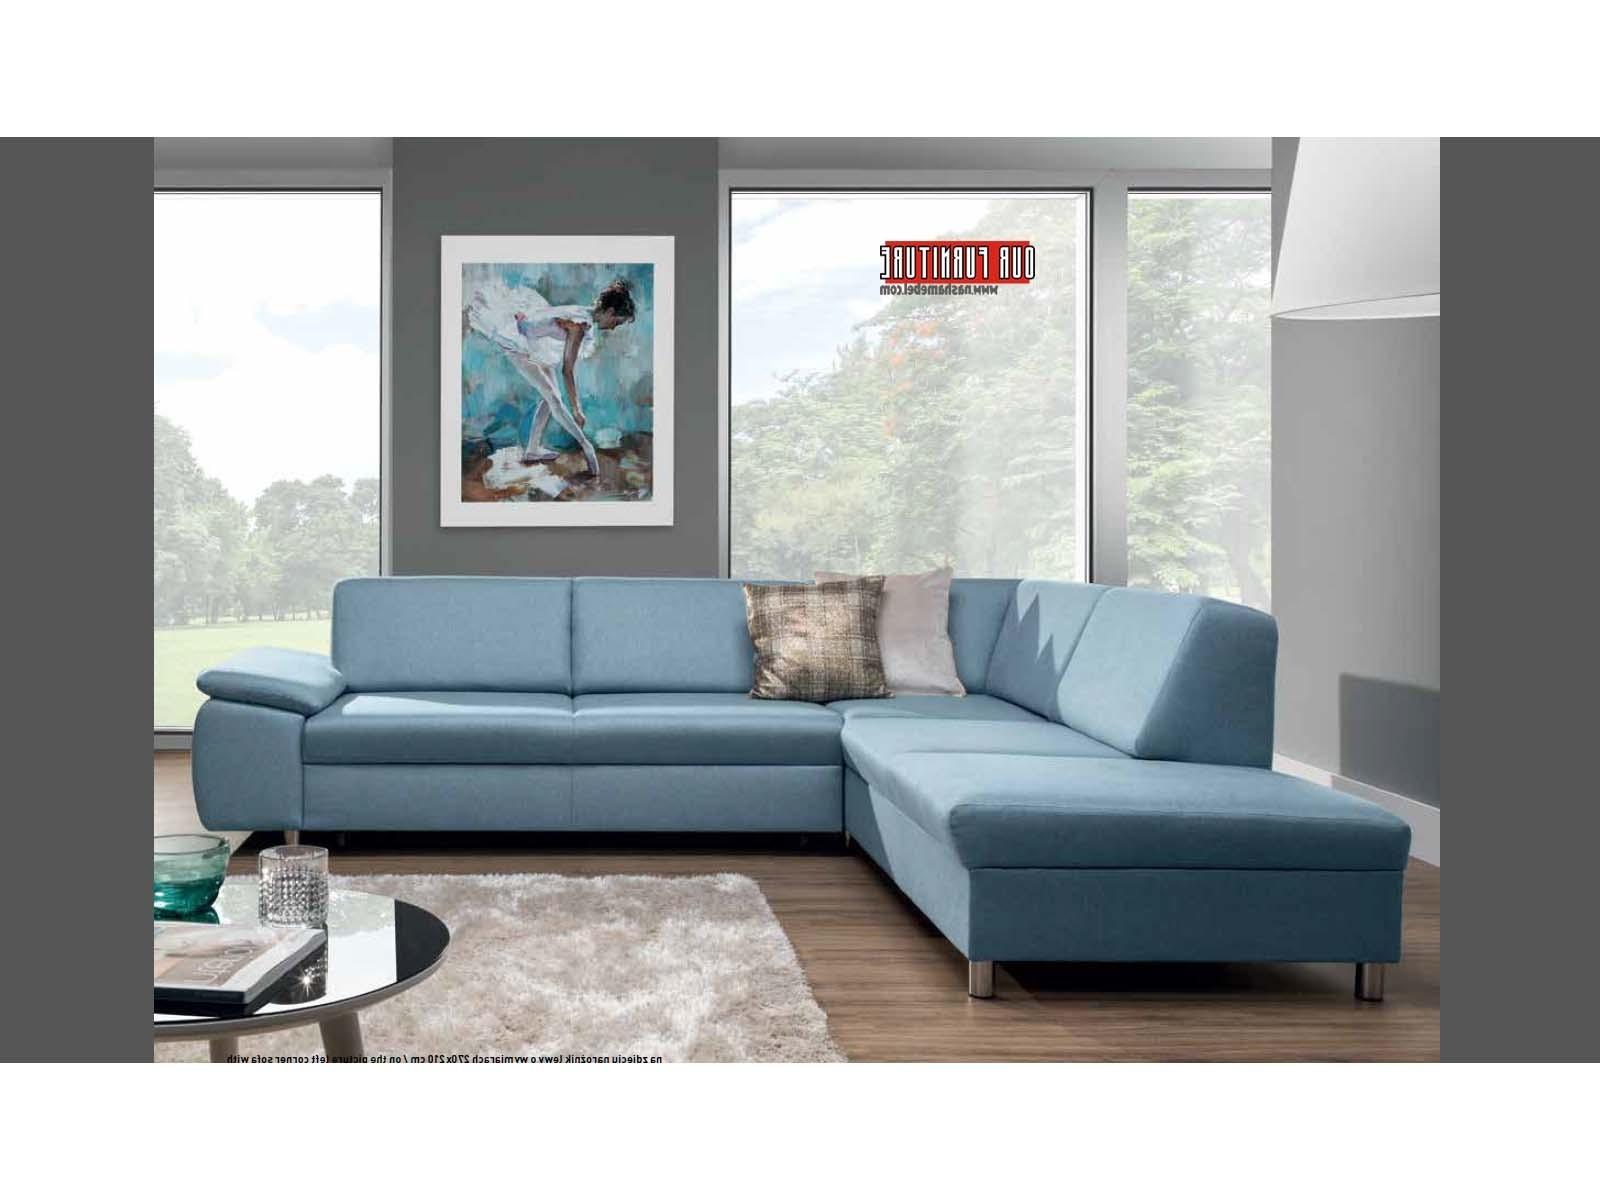 Niagara Sectional Sofas Regarding Most Current Niagara(St)Sectional Sofa Bed (View 6 of 15)